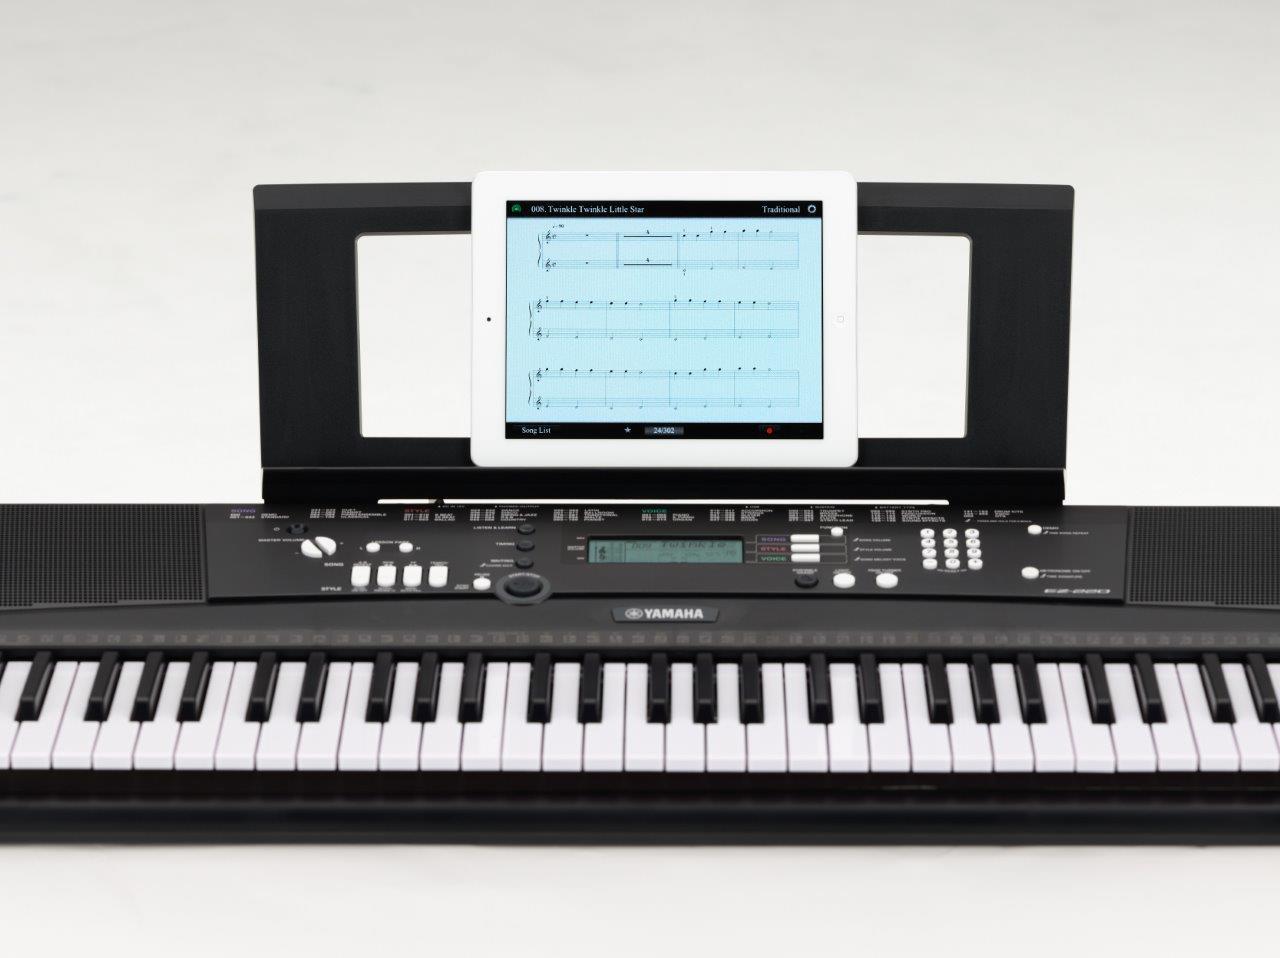 Yamaha EZ220 - a top 10 61 key keyboard piano for beginners